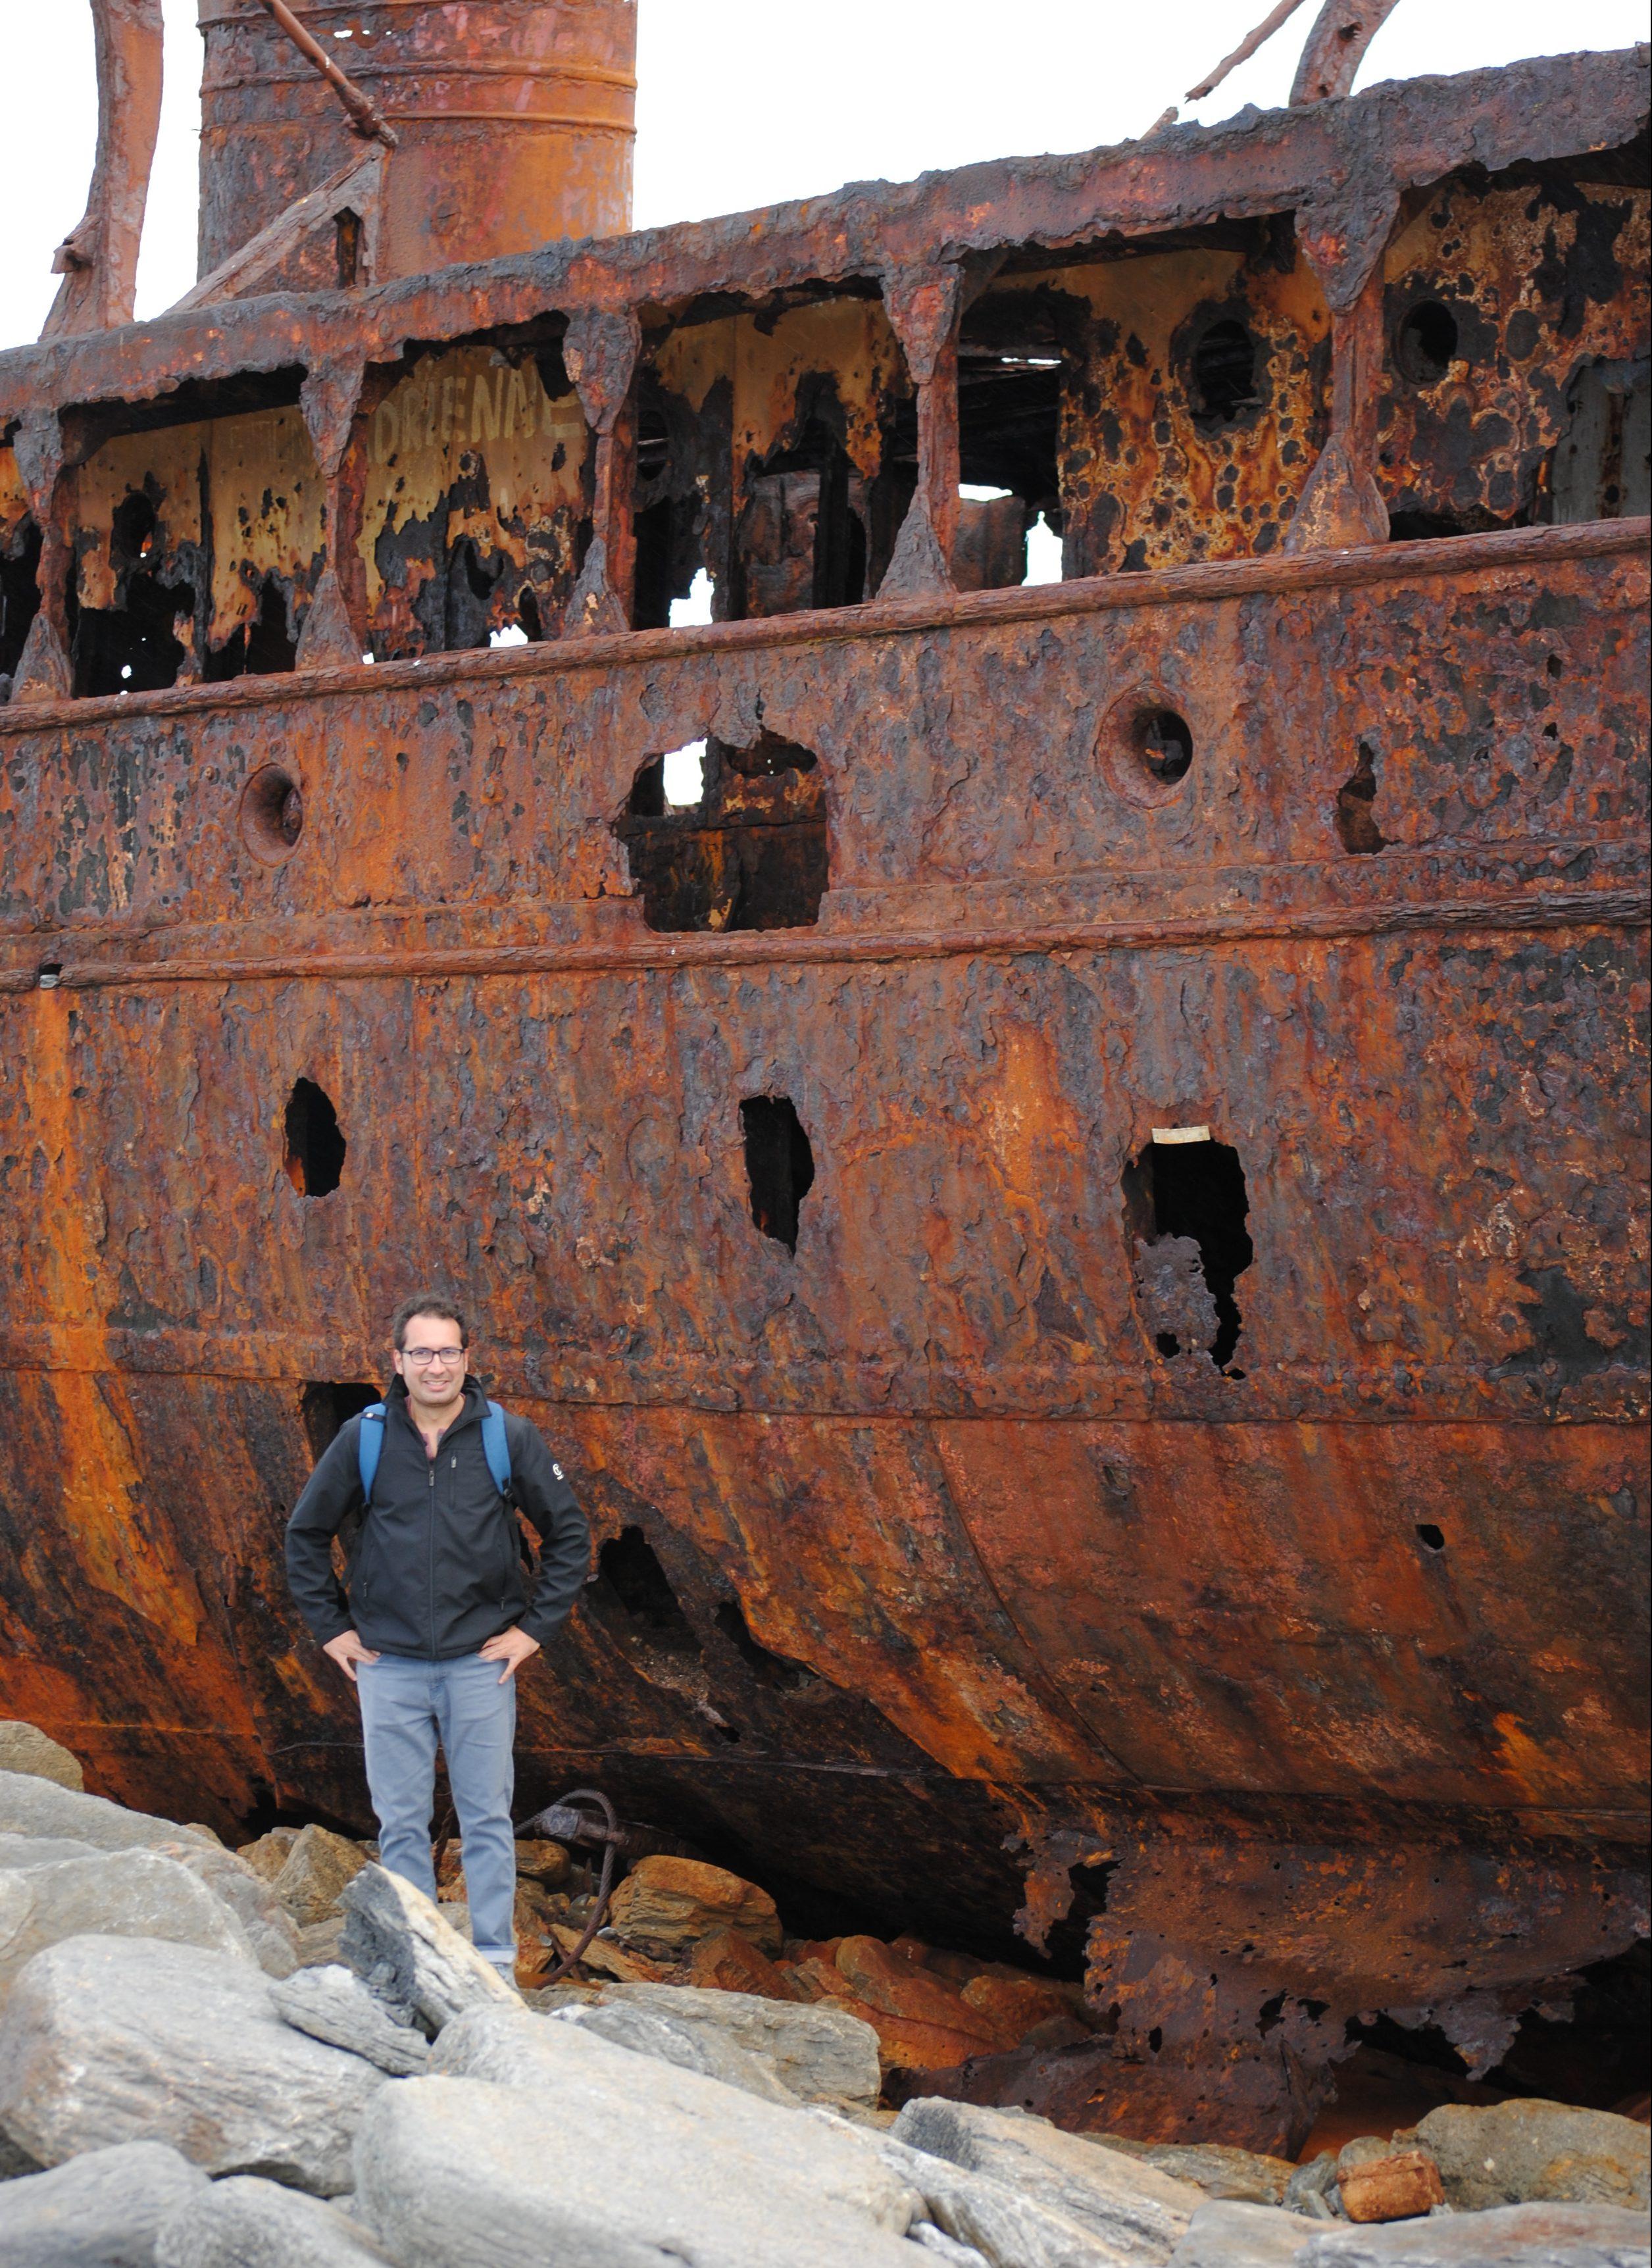 Plassey shipwreck in Ireland